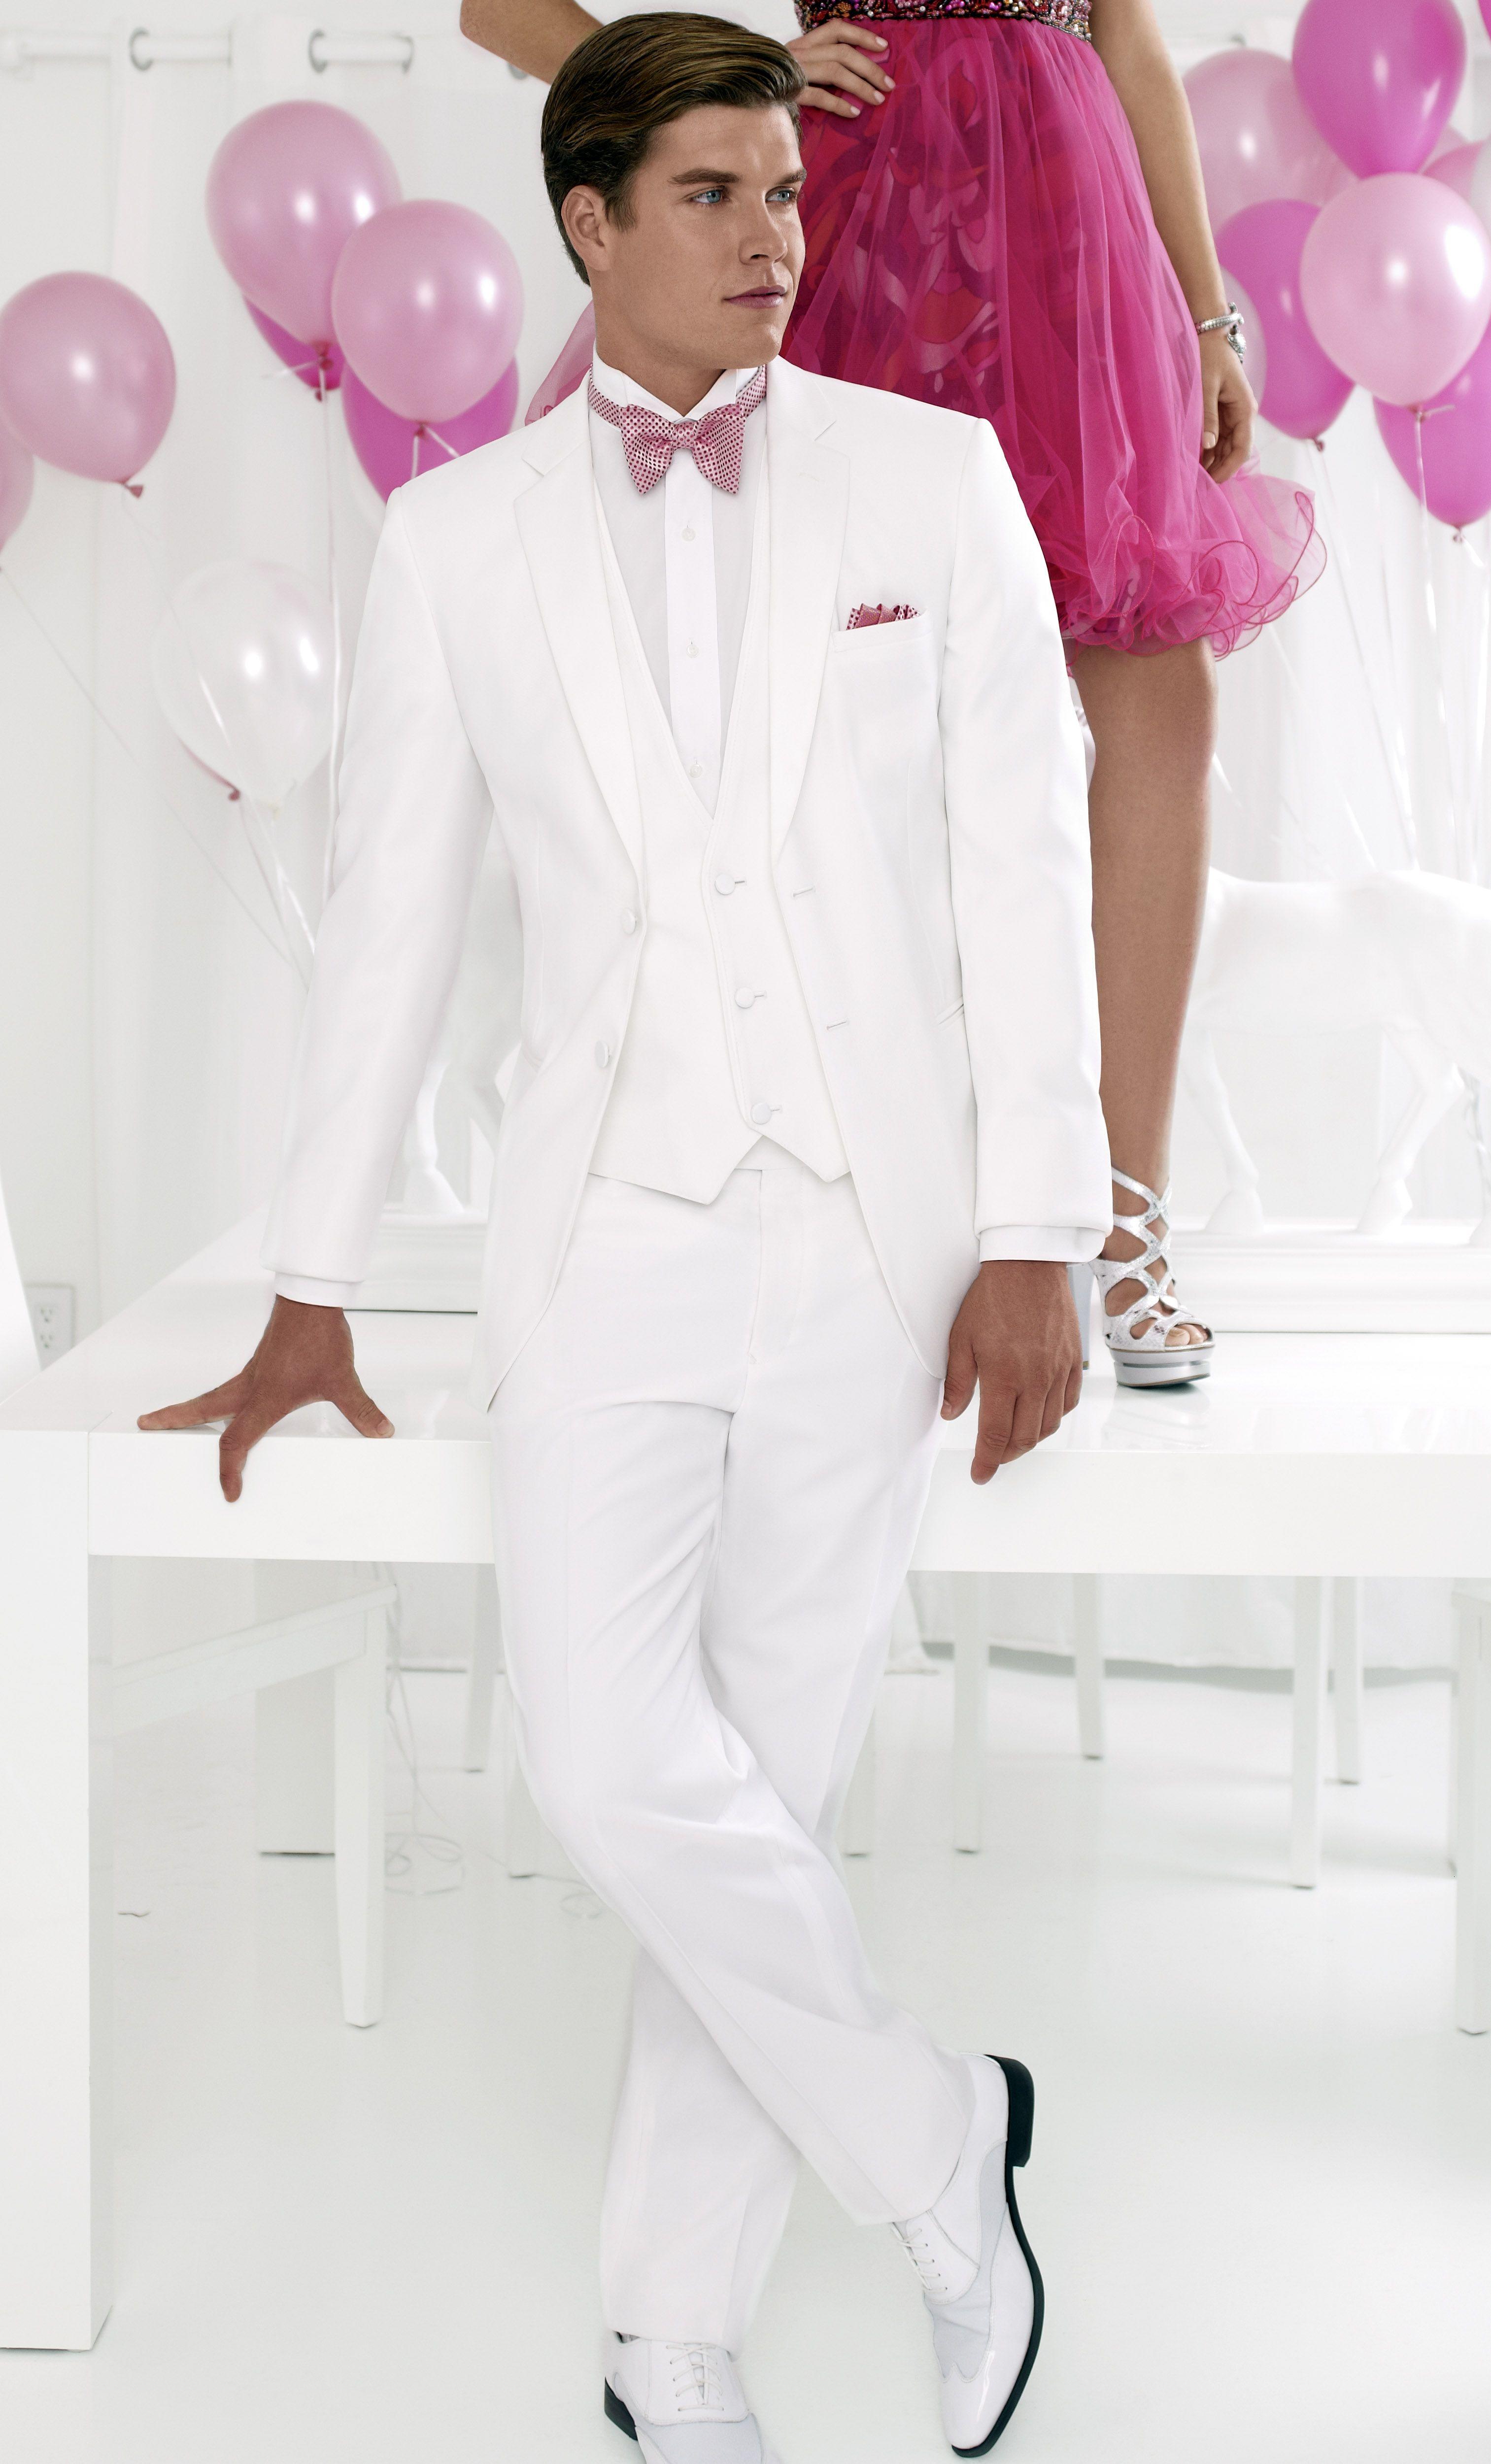 Enchanting All White Tuxedos Prom Component - Wedding Dress Ideas ...